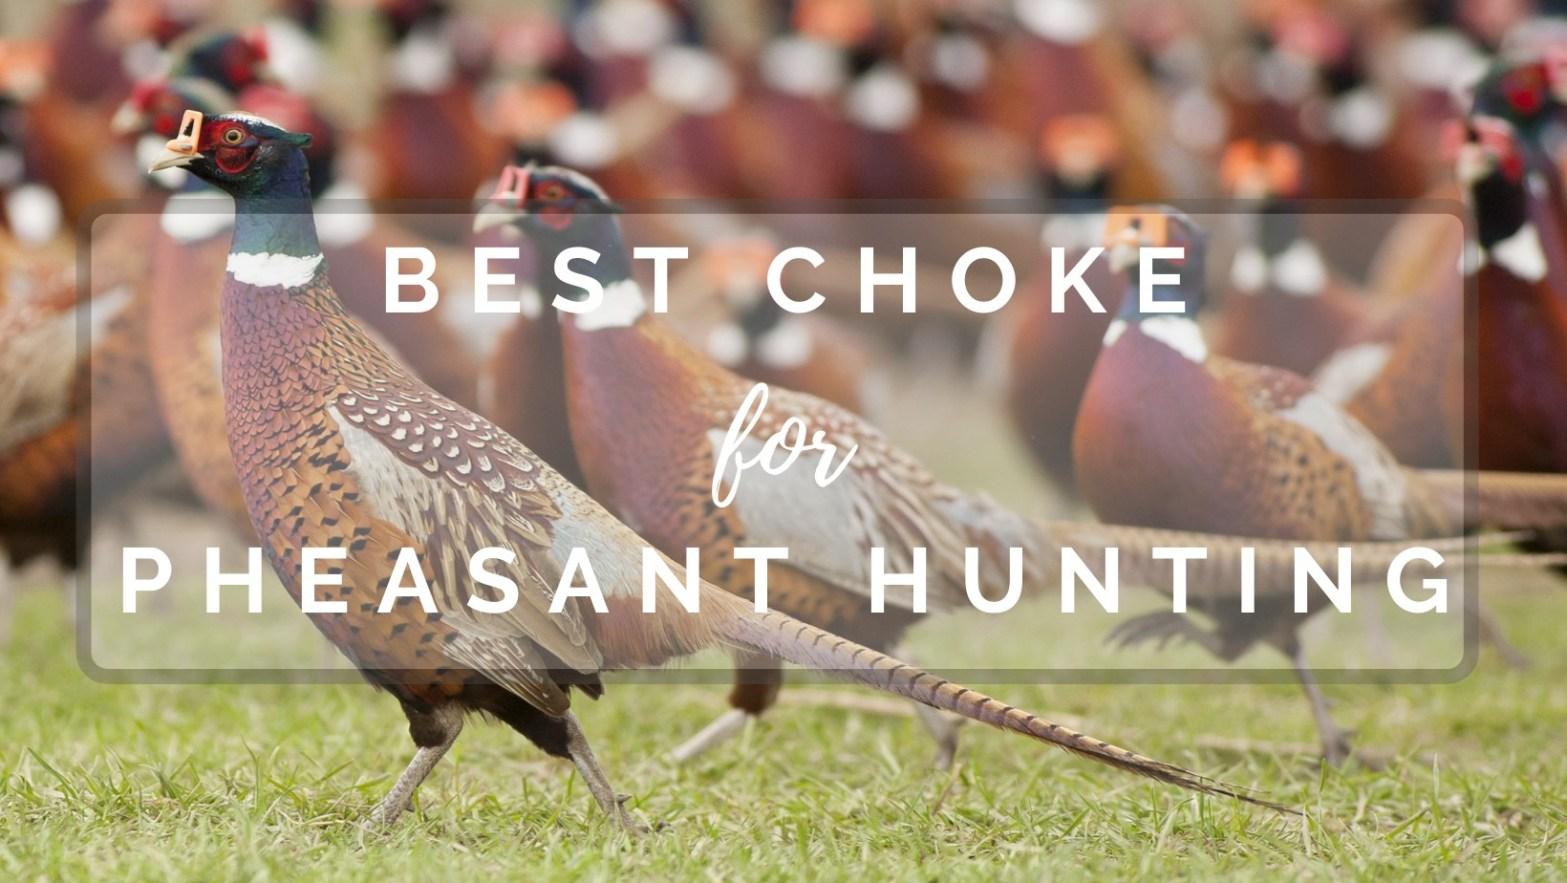 best choke for pheasant hunting